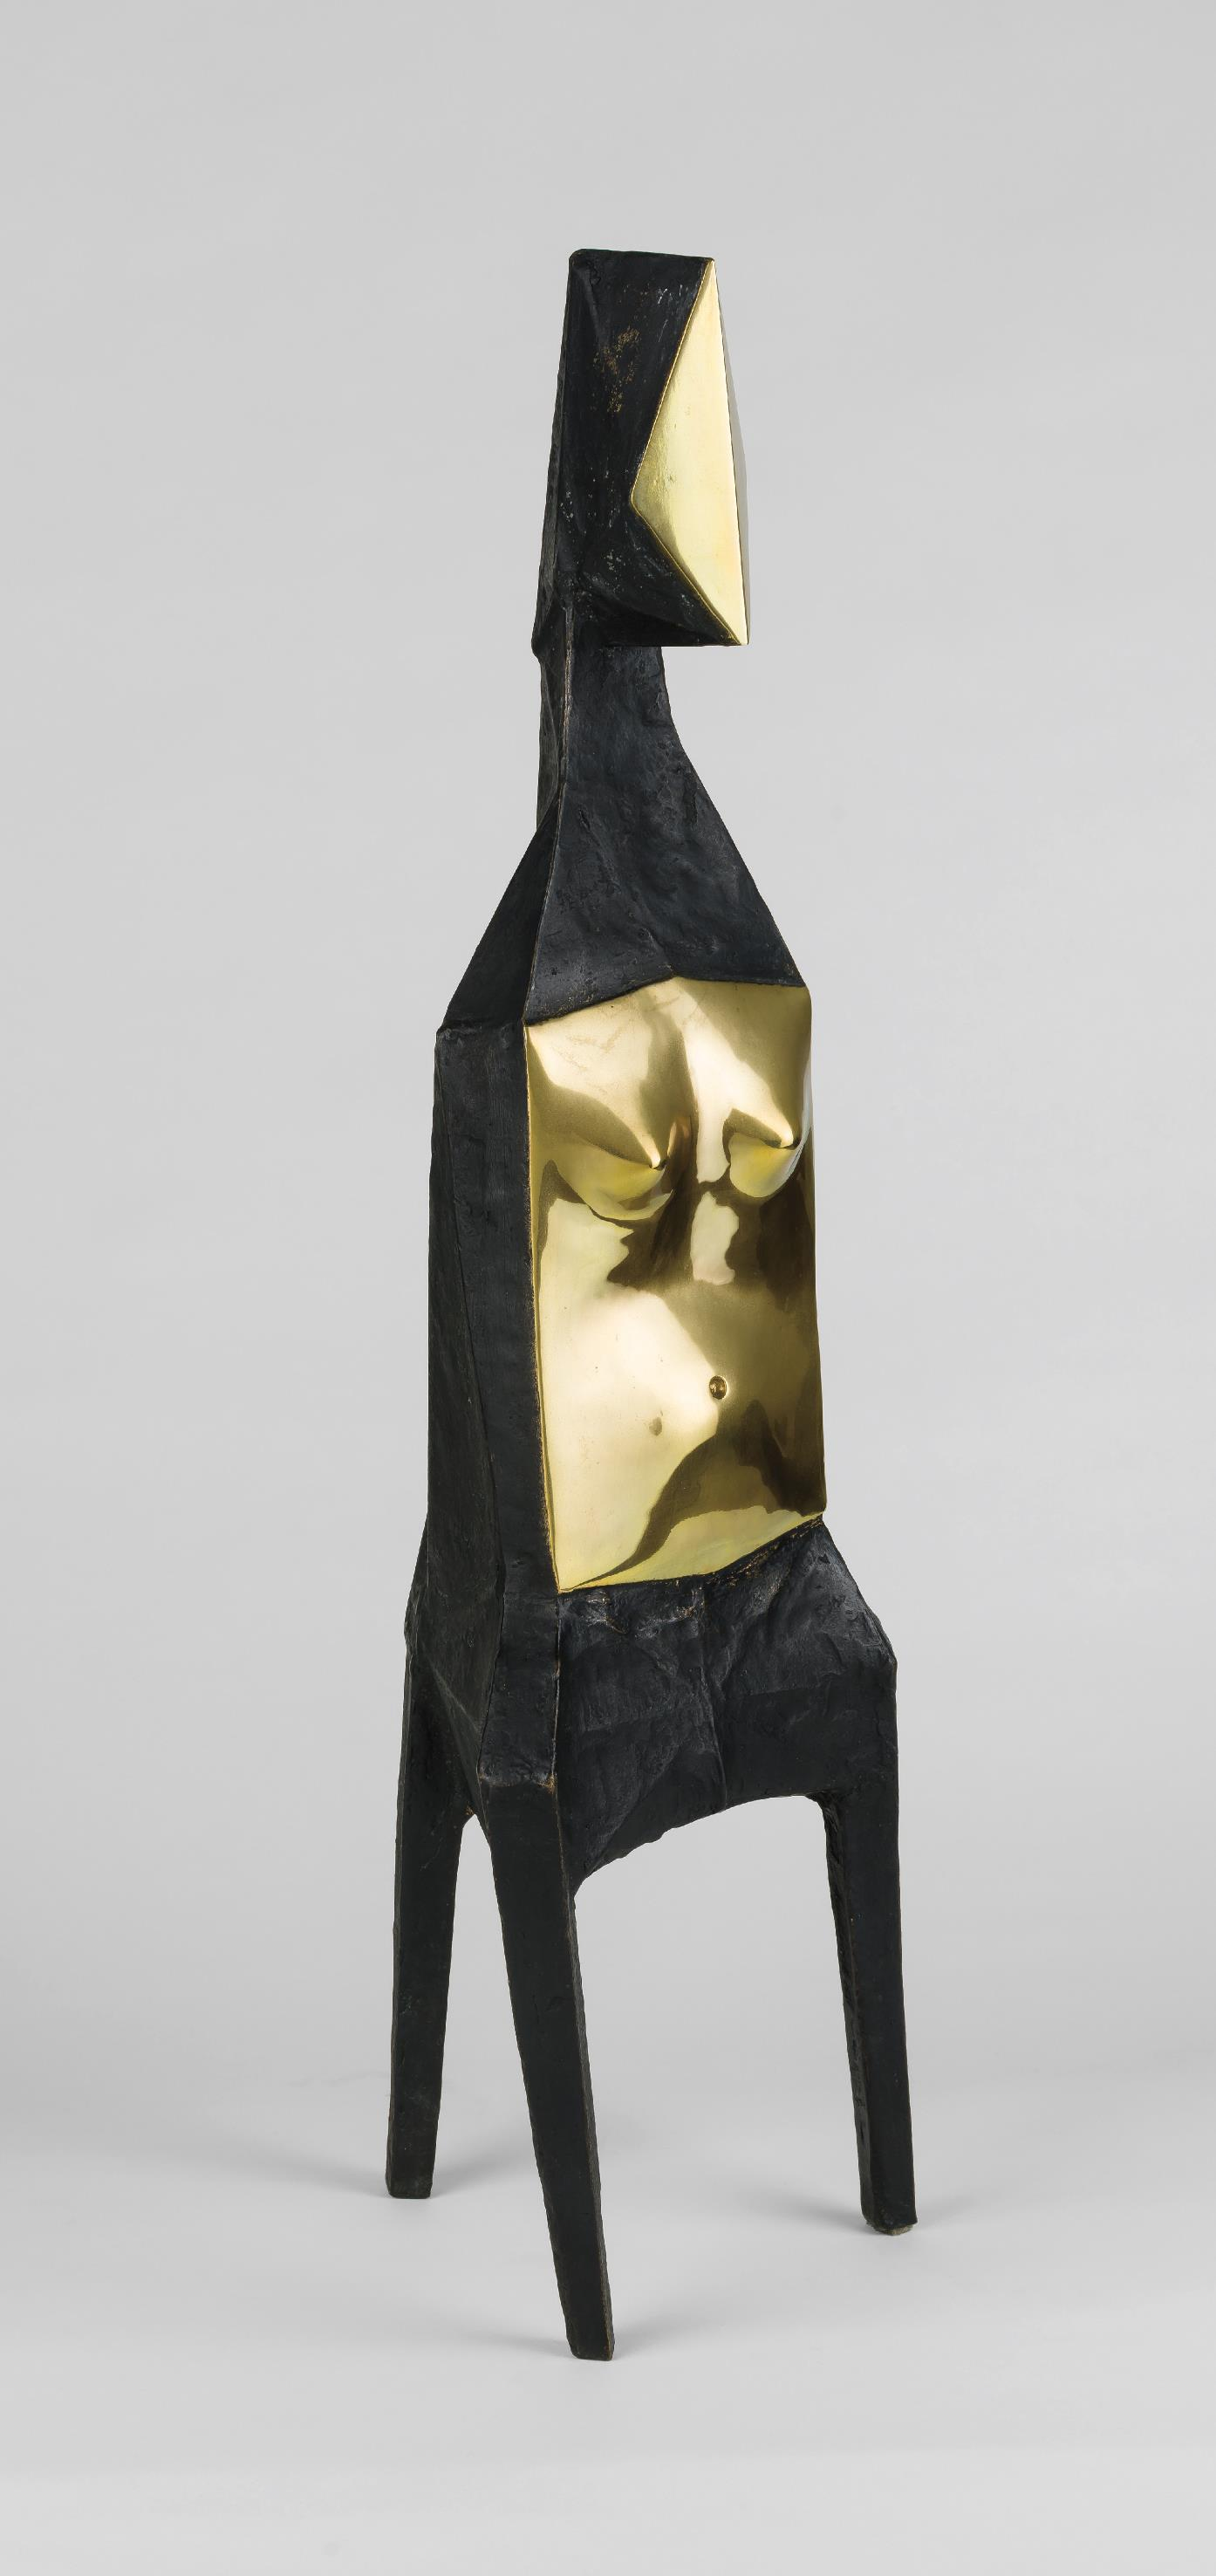 Lynn Chadwick-Maquette IV Elecktra-1969